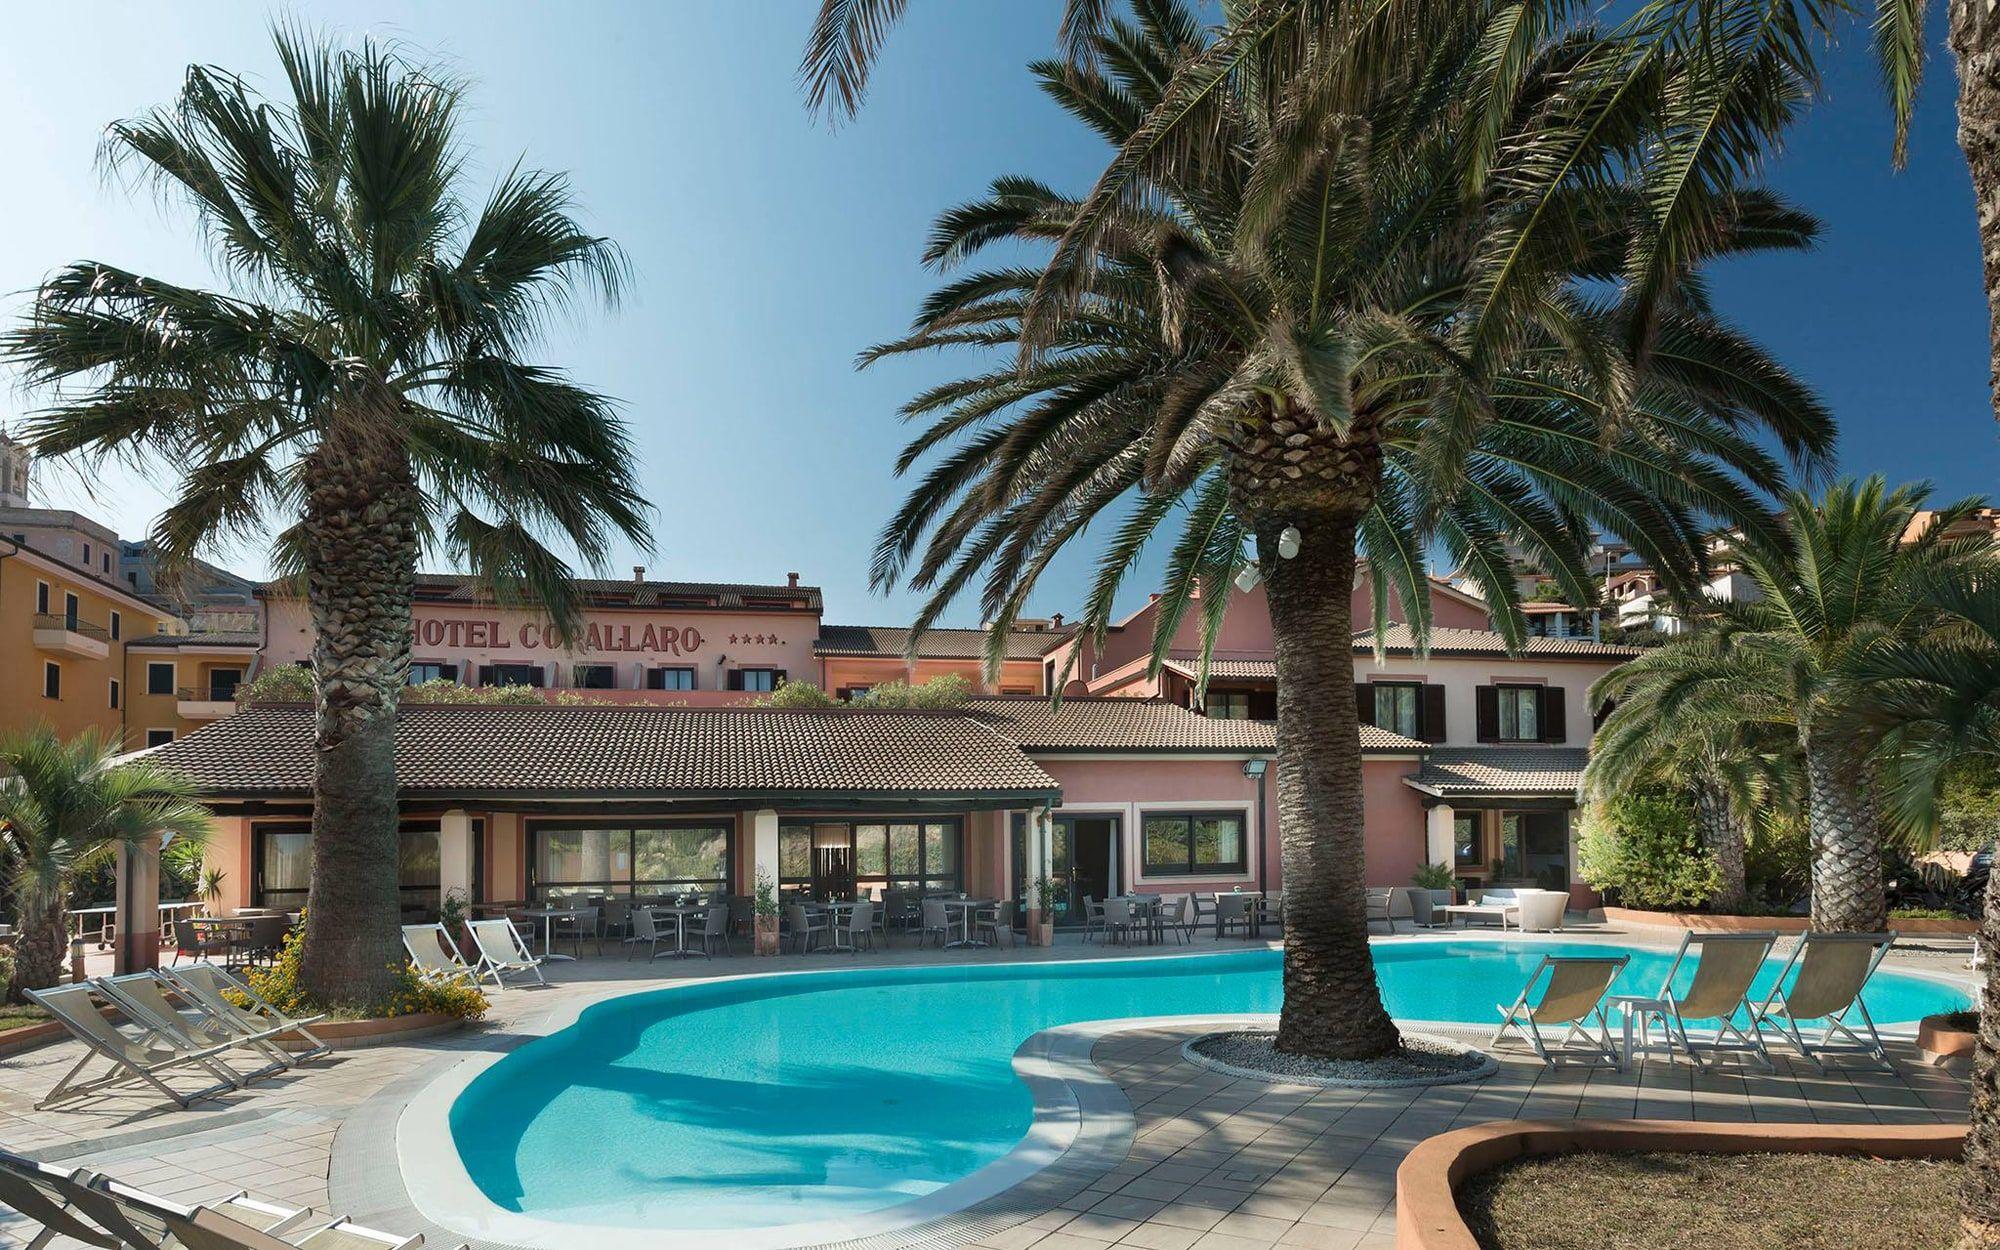 Hotels | Best hotels in sardinia, Sardinia hotels, Hotel deals